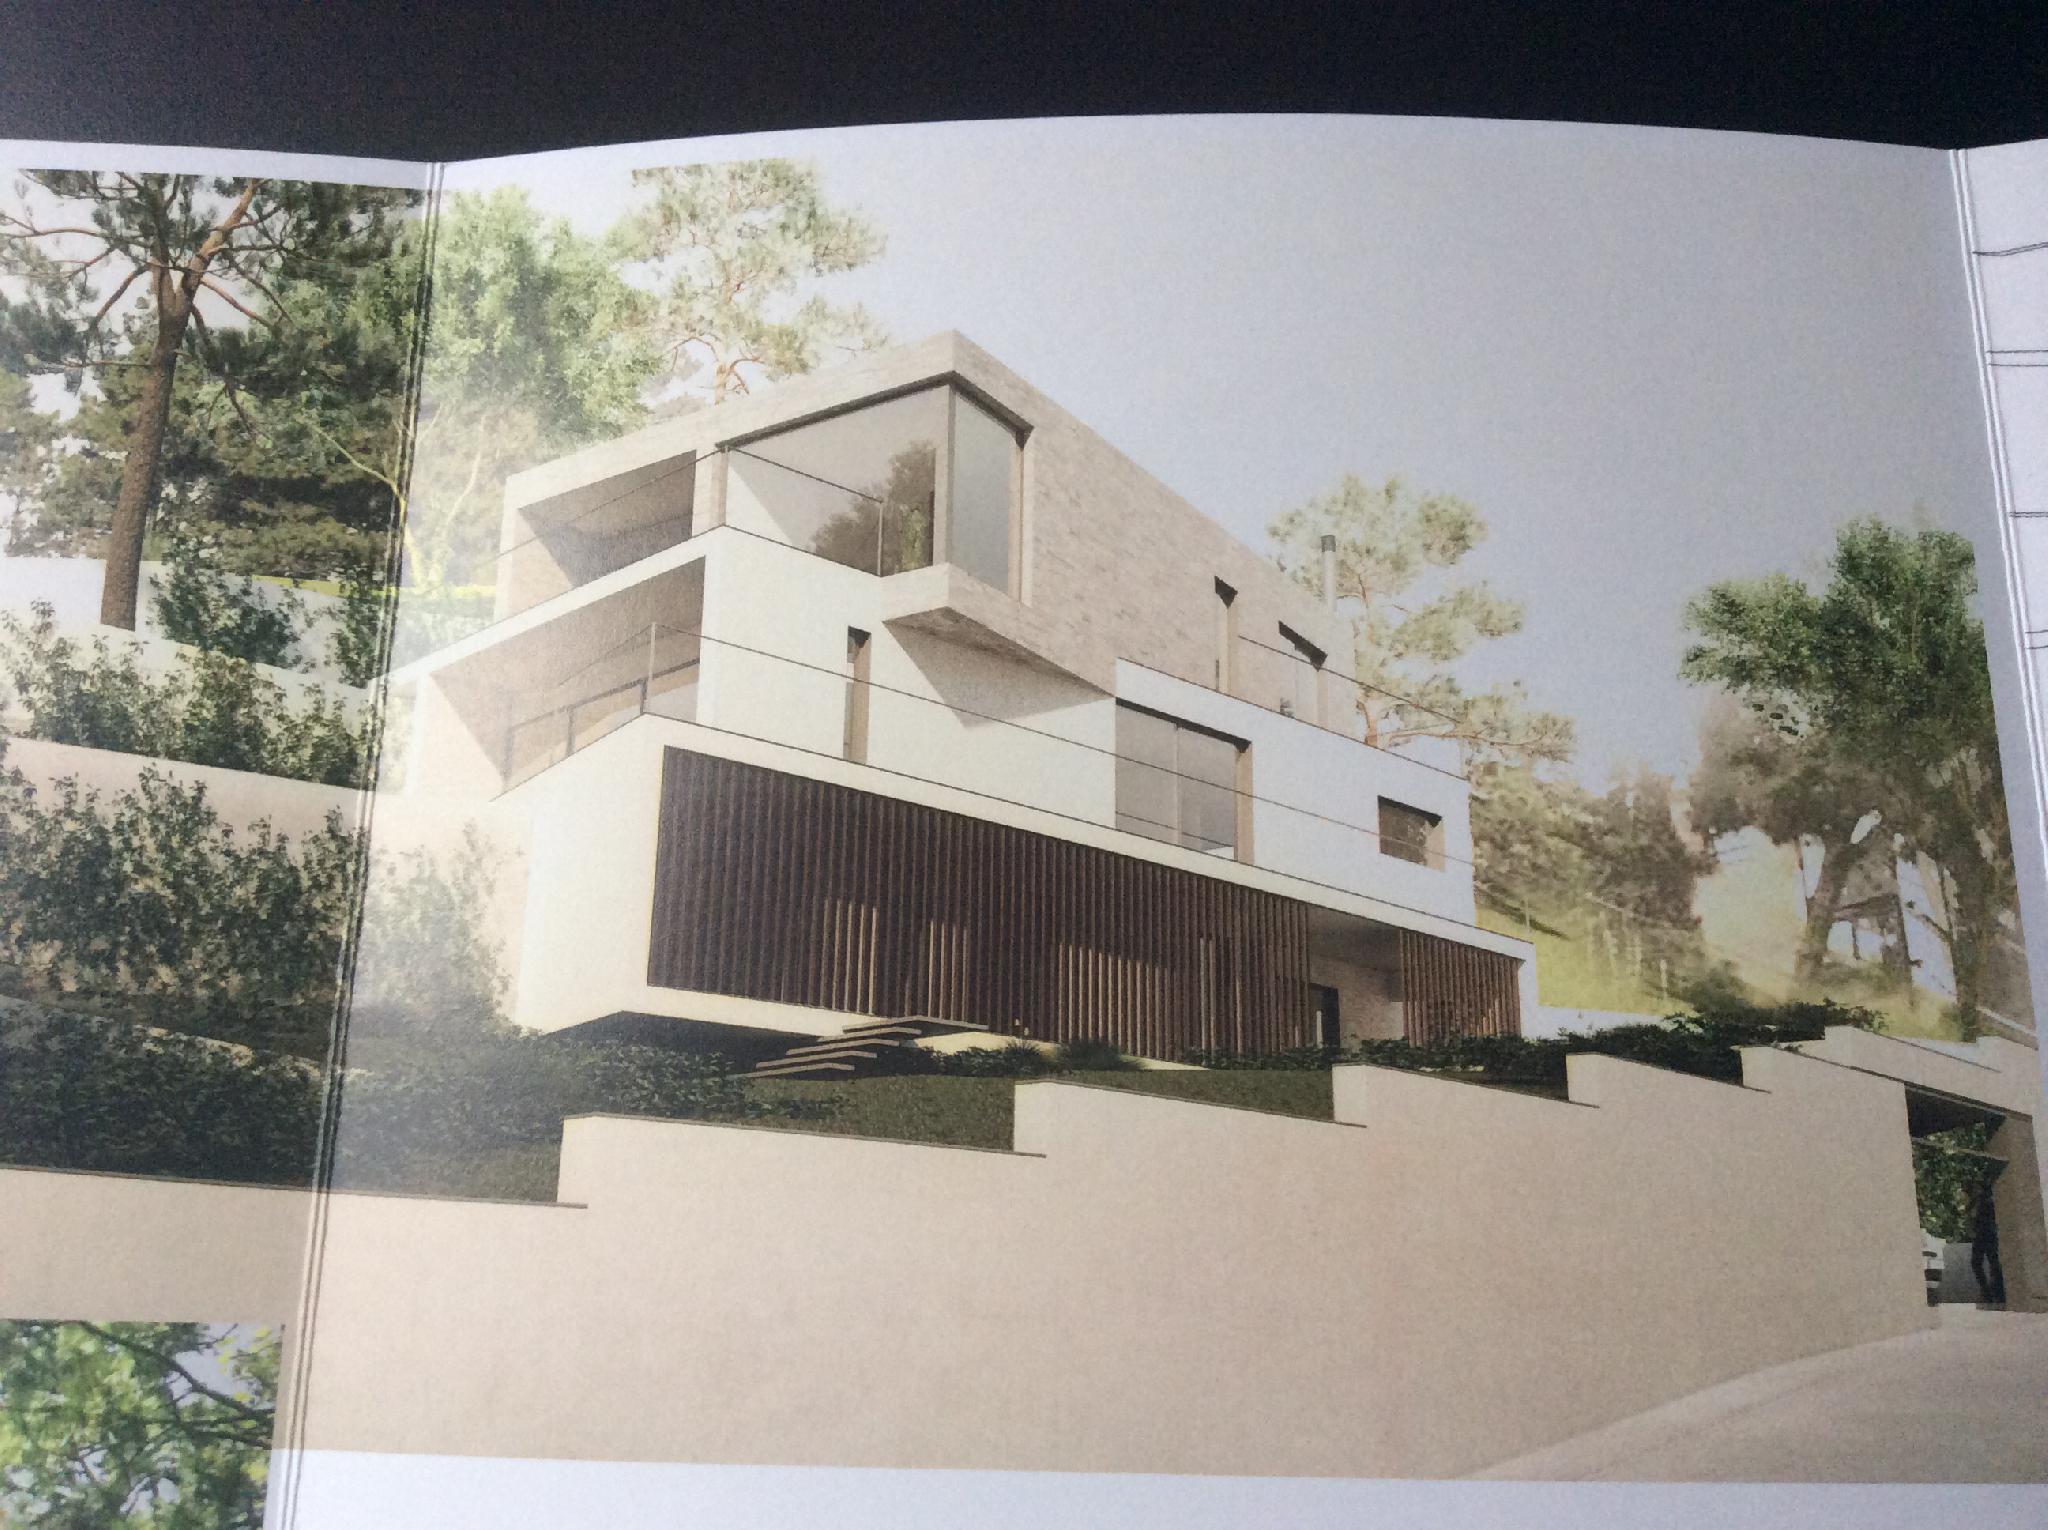 100069 Solar Urbano en venda en Sarrià-Sant Gervasi, Tres Torres 1